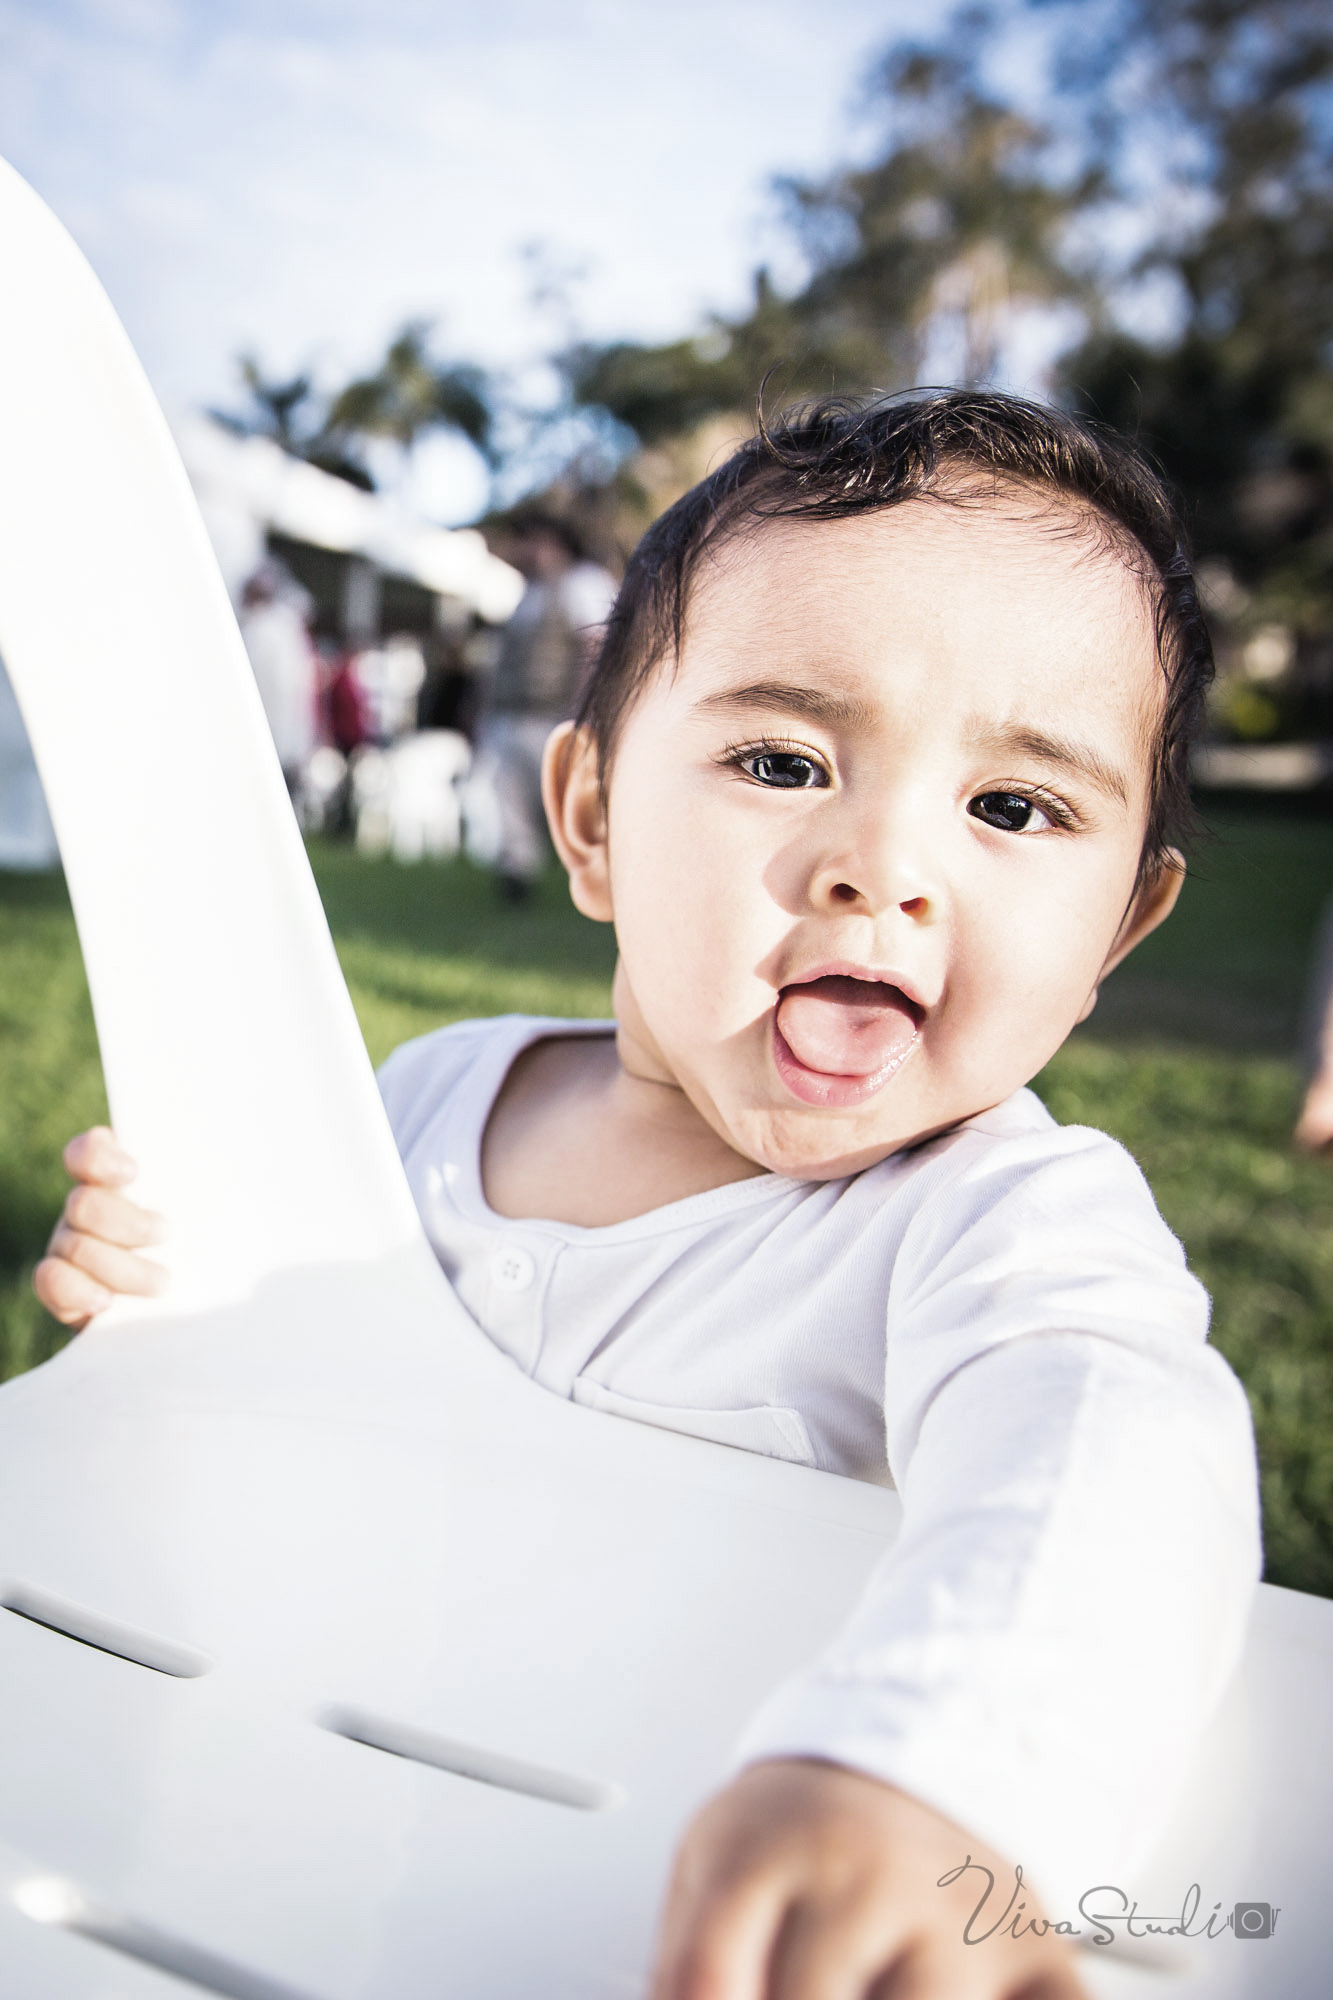 VivaStudio_Newborn_Baby_Family_Photography_Toowoong_Perrin_Park_Brisbane_050